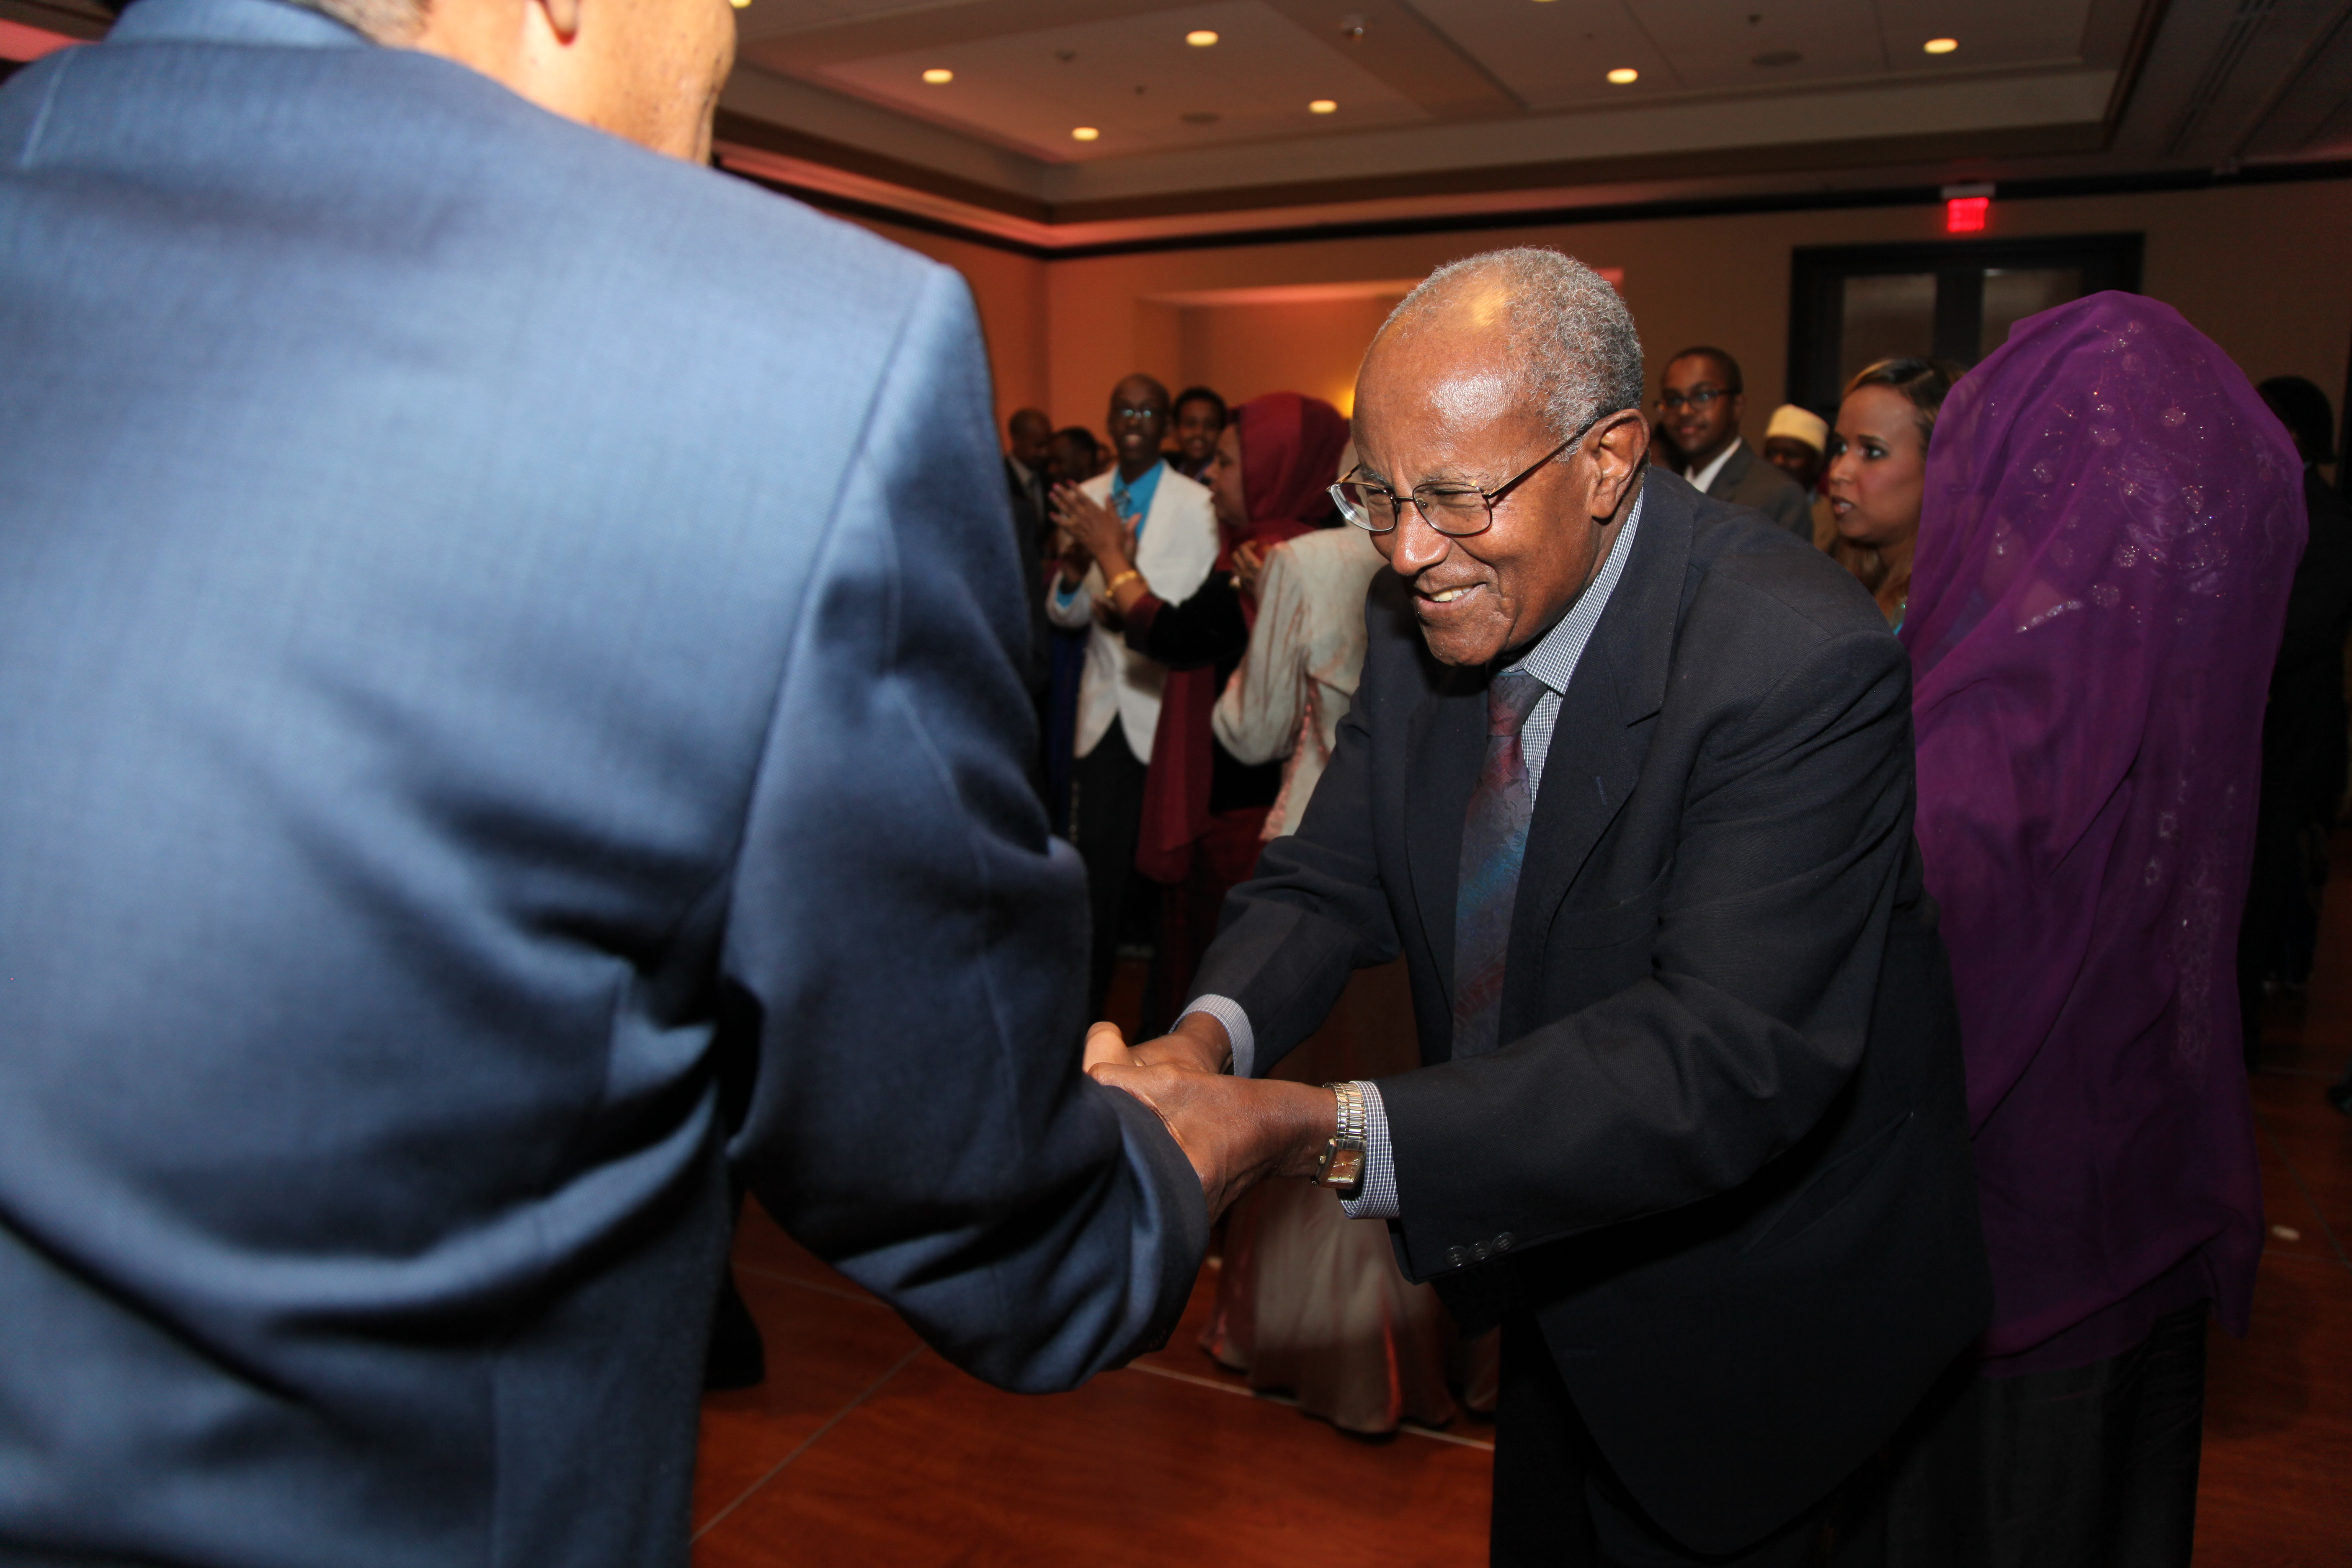 Reception handshake